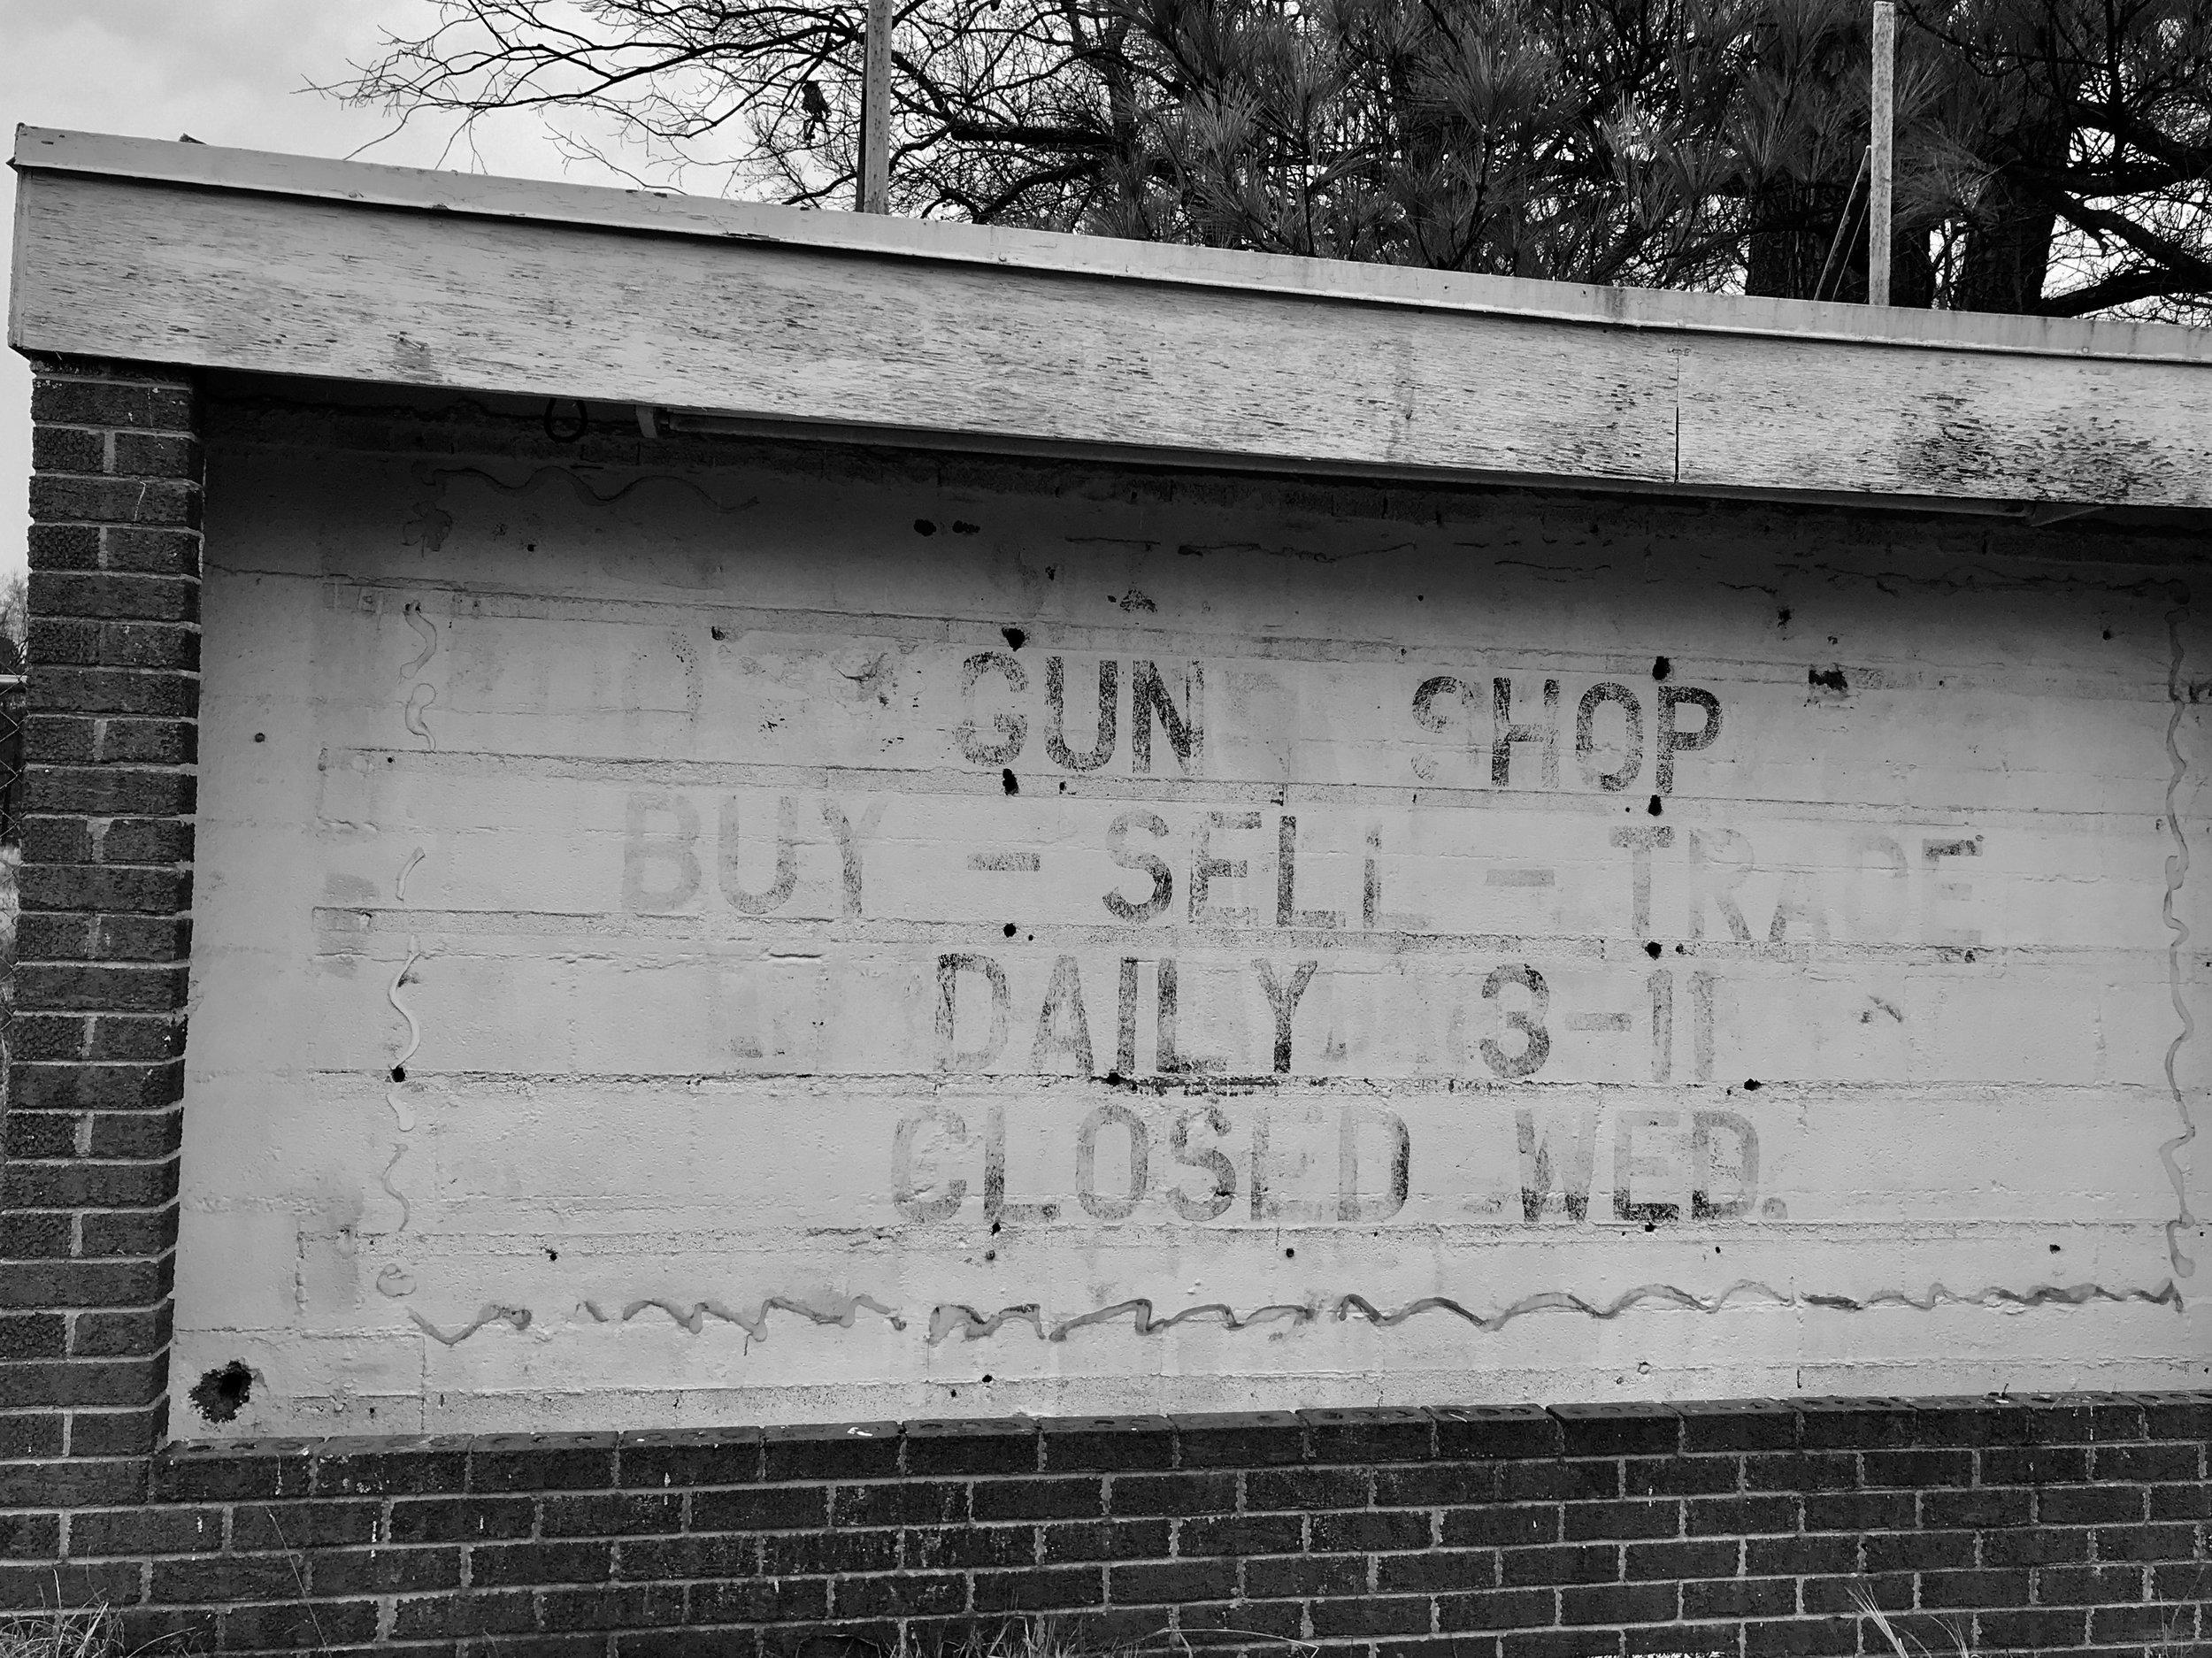 gun+shop+starlite+ (1).jpeg